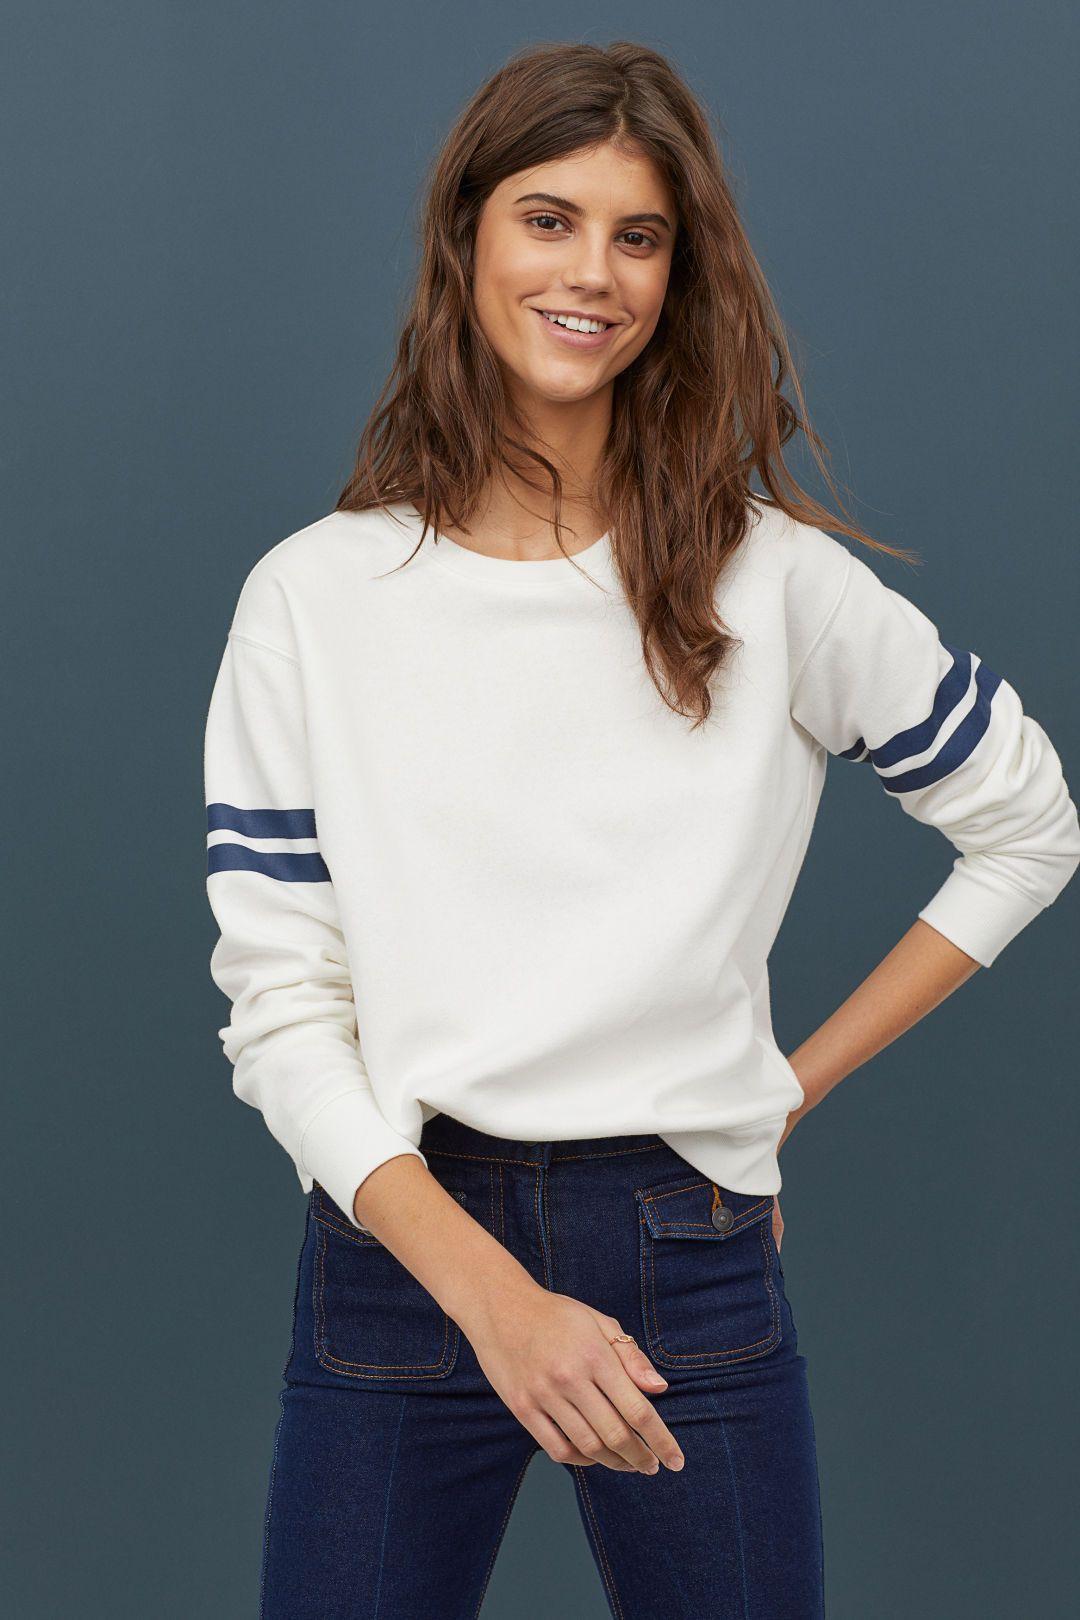 Sweatshirt White Dark Blue Ladies H M Us White Sweatshirt Sweatshirts Fashion [ 1620 x 1080 Pixel ]